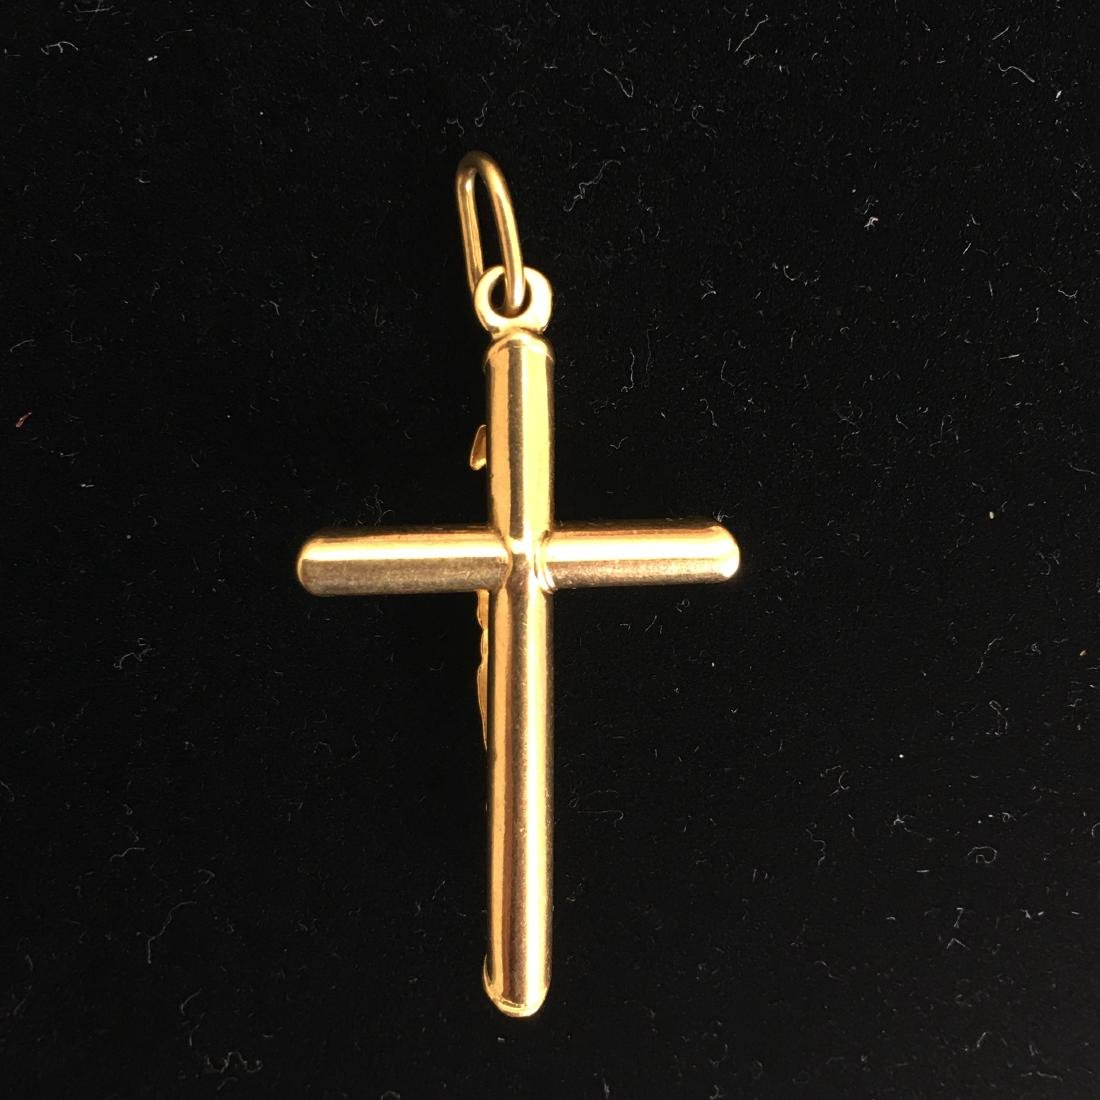 18kt cross pendant - 3